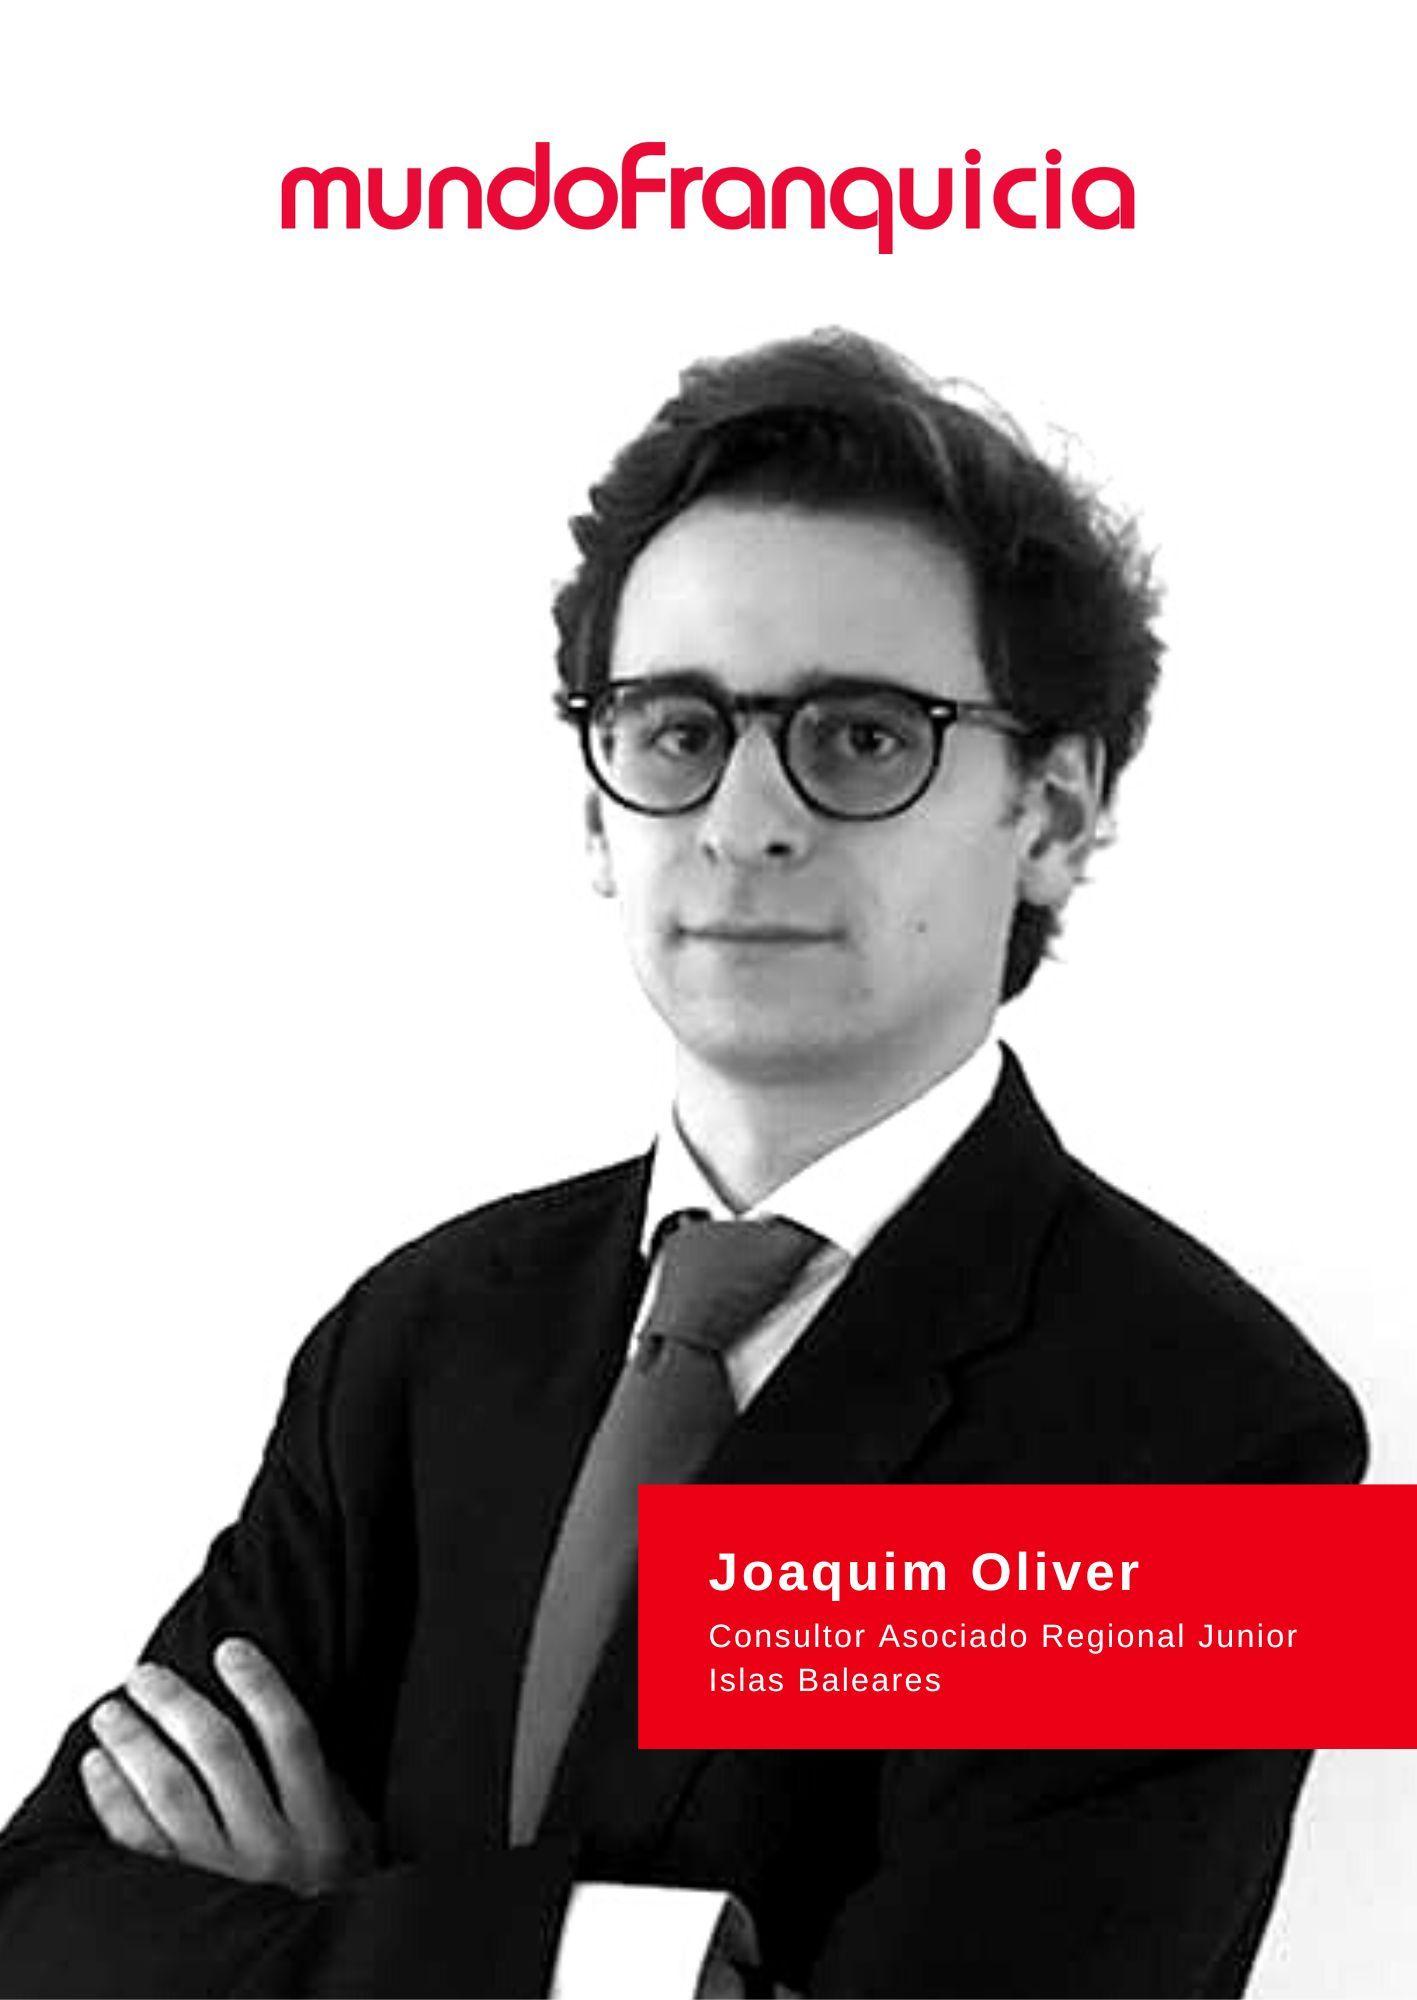 Joaquim Oliver